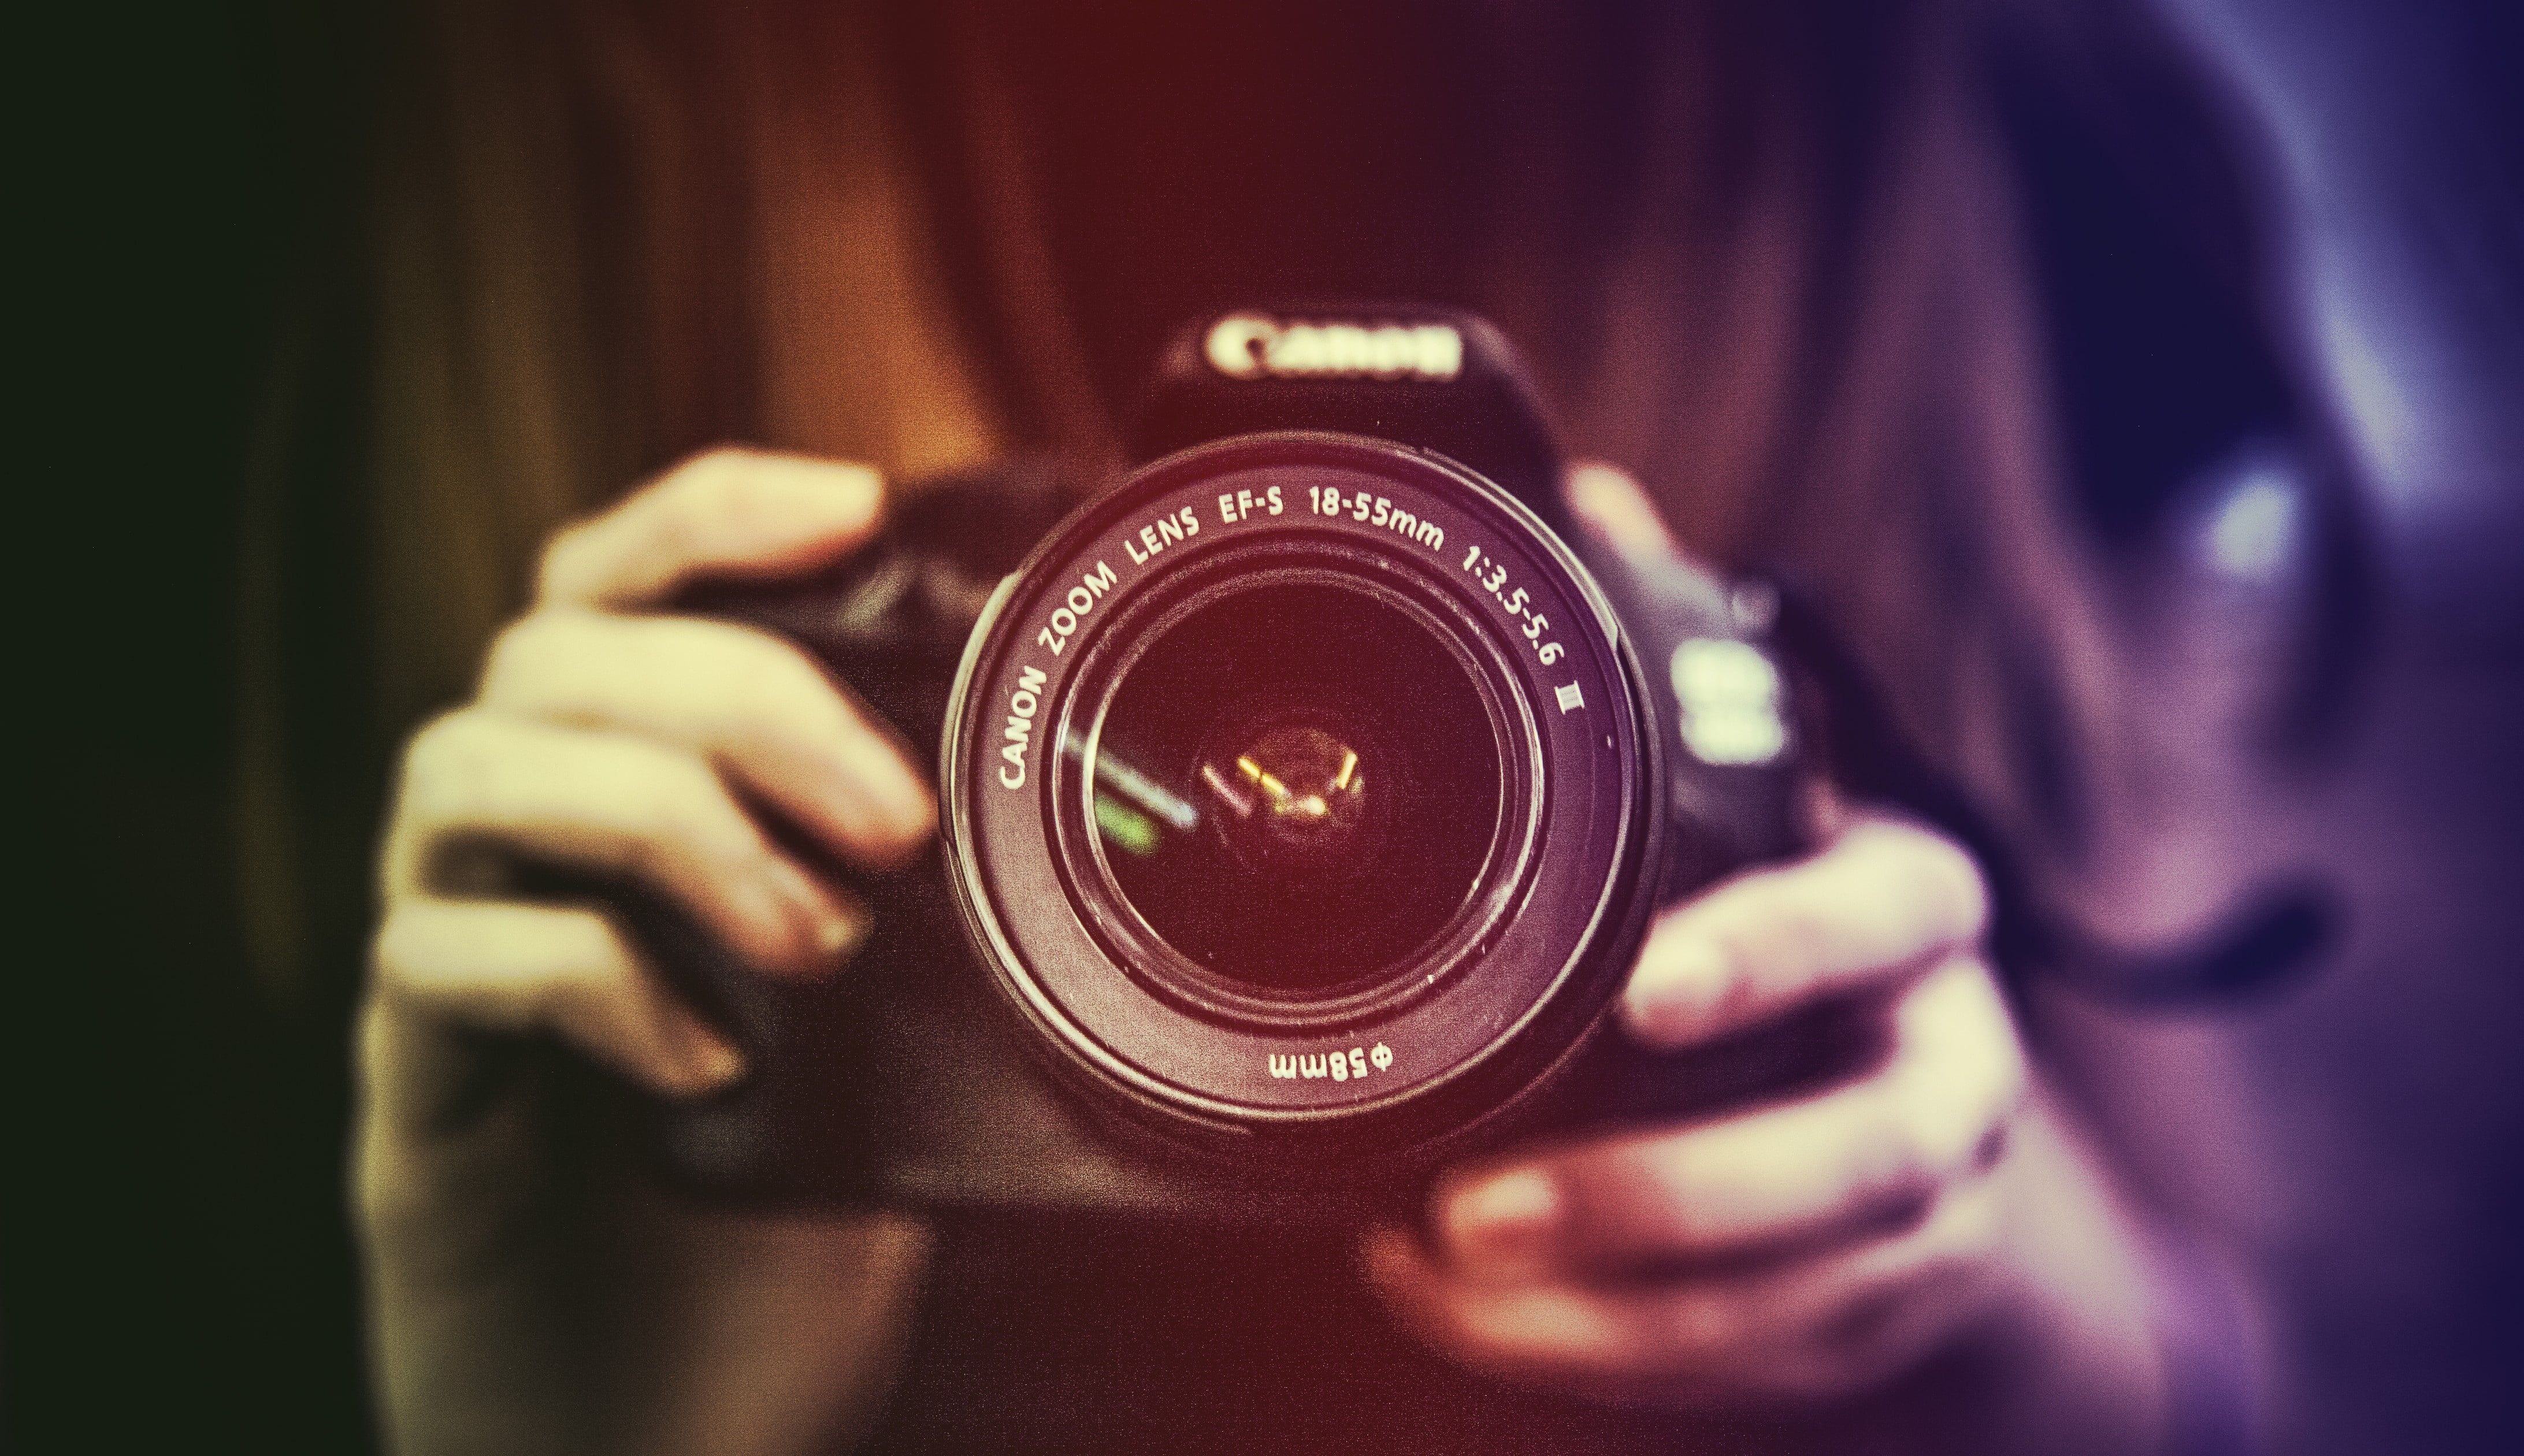 Canon Camera Wallpapers Top Free Canon Camera Backgrounds Wallpaperaccess